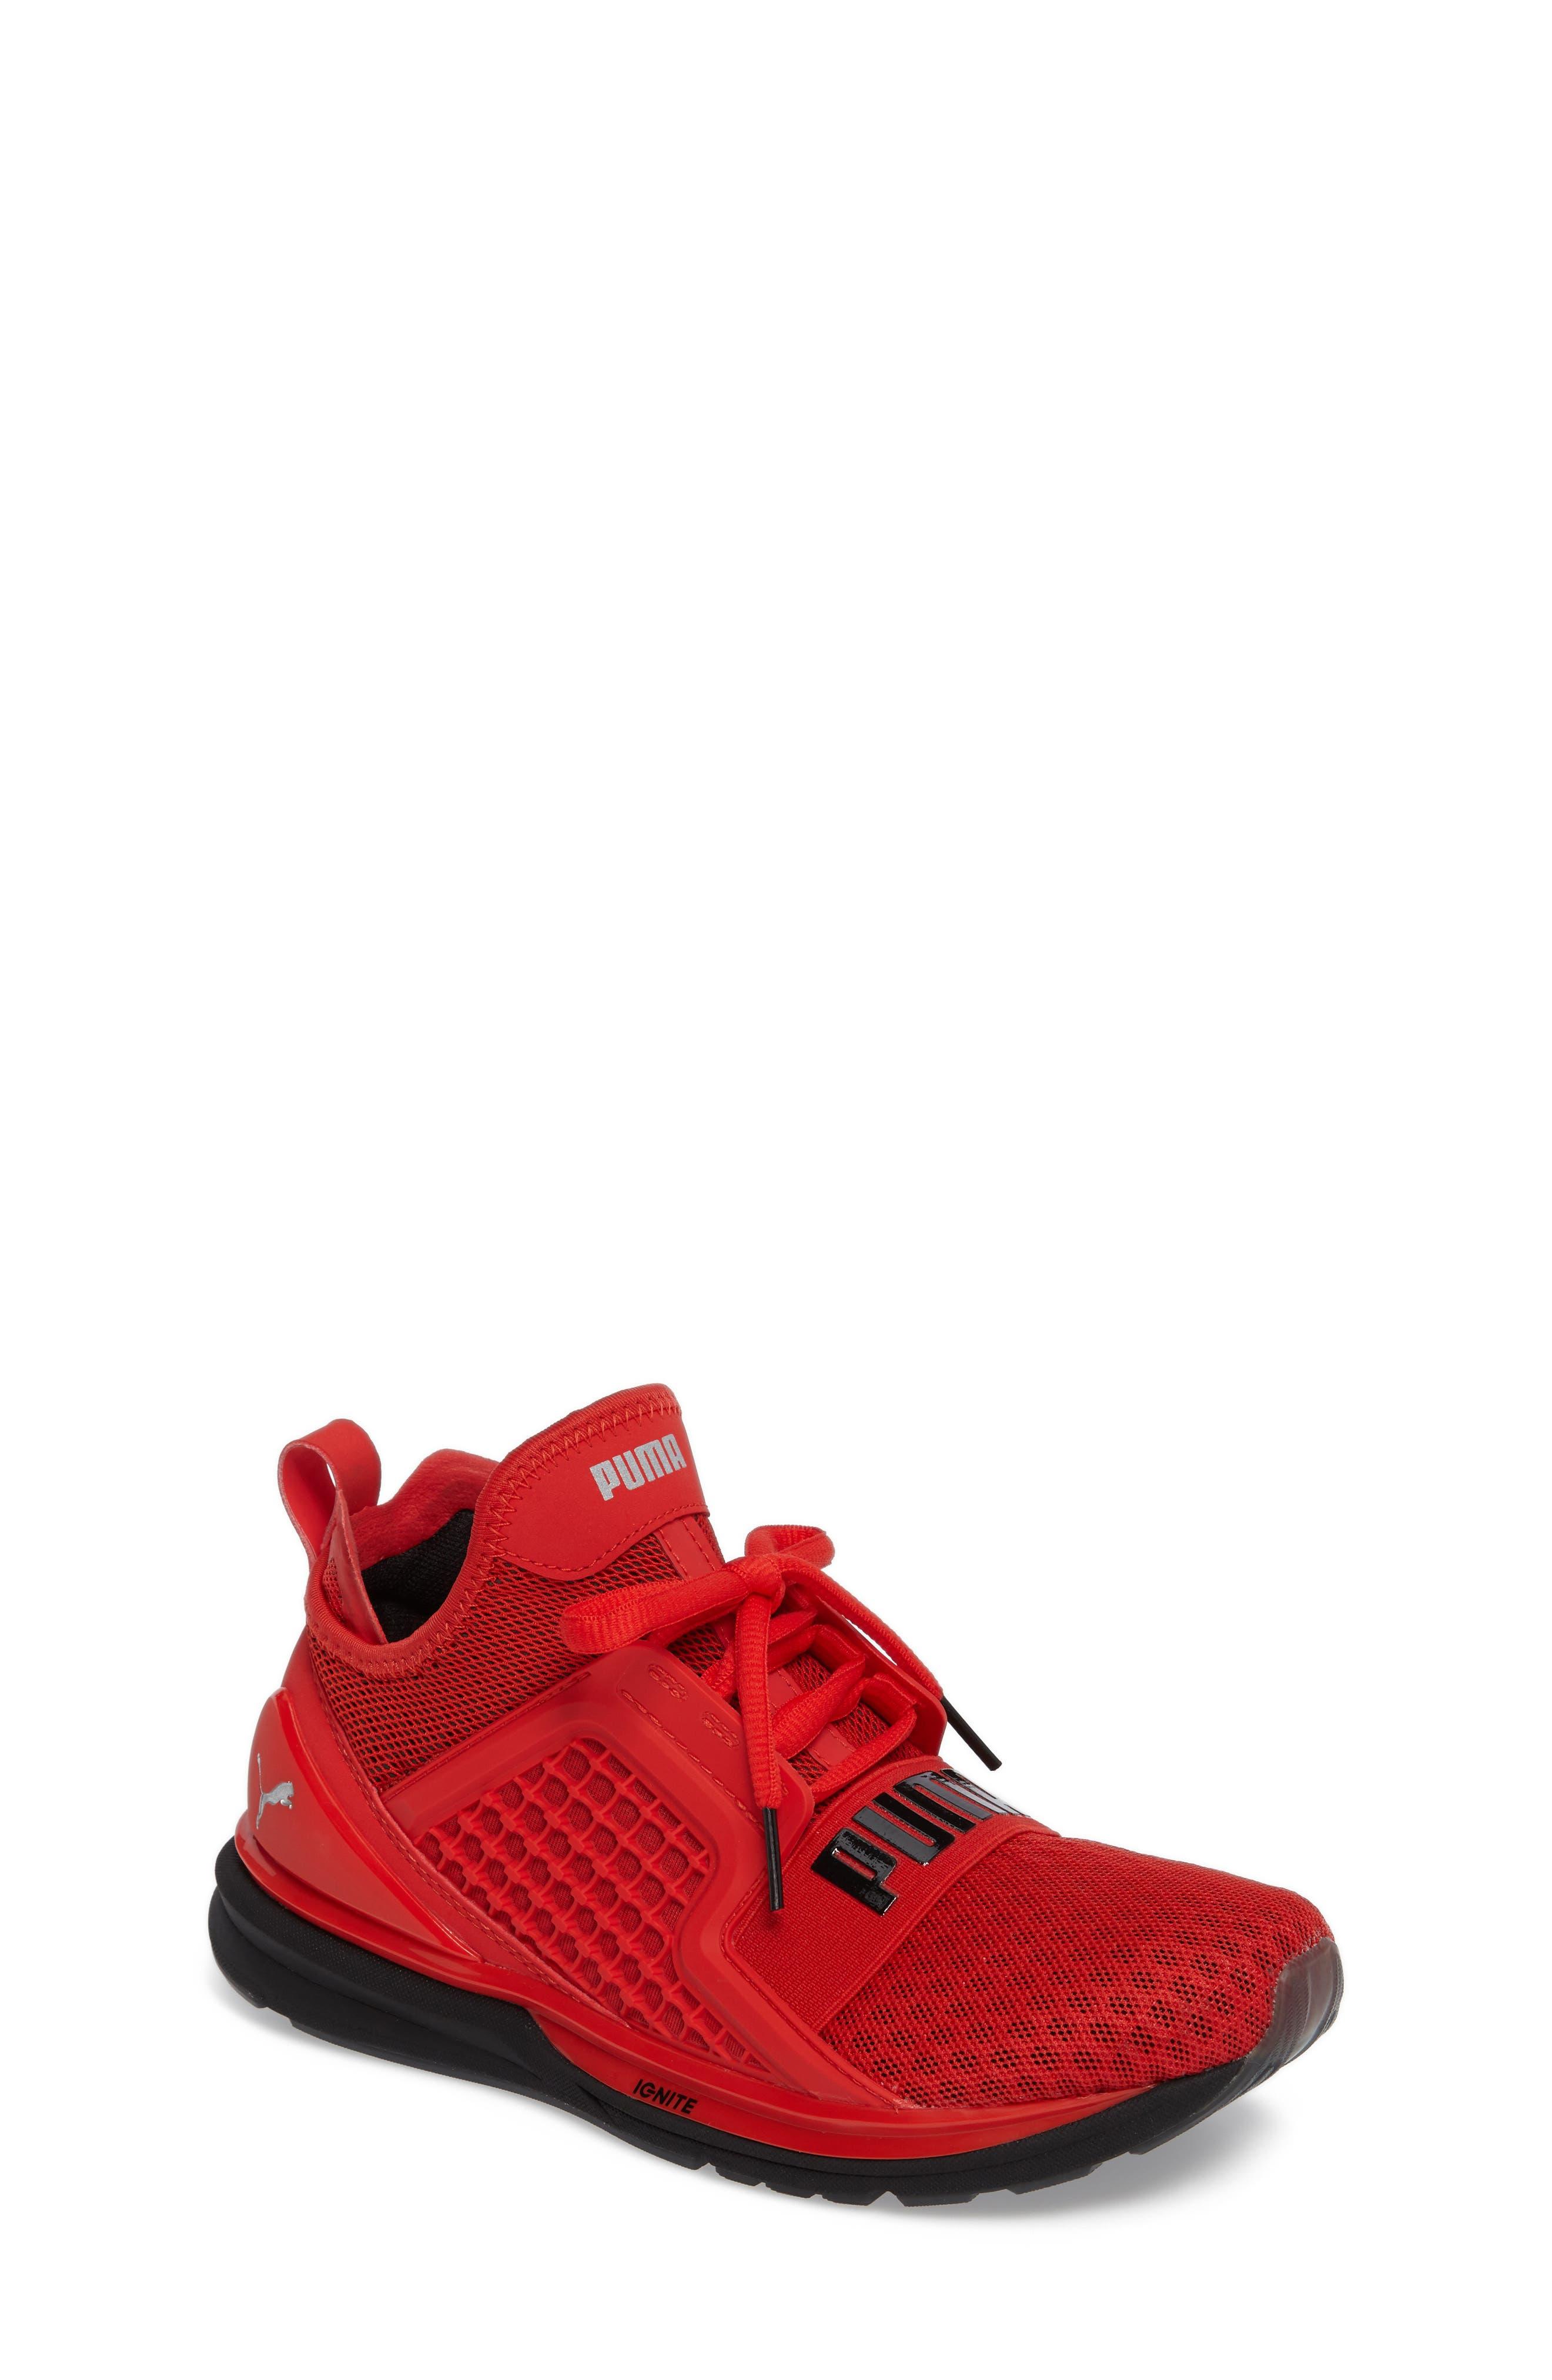 puma ignite limitless. main image - puma ignite limitless sneaker (big kid) puma